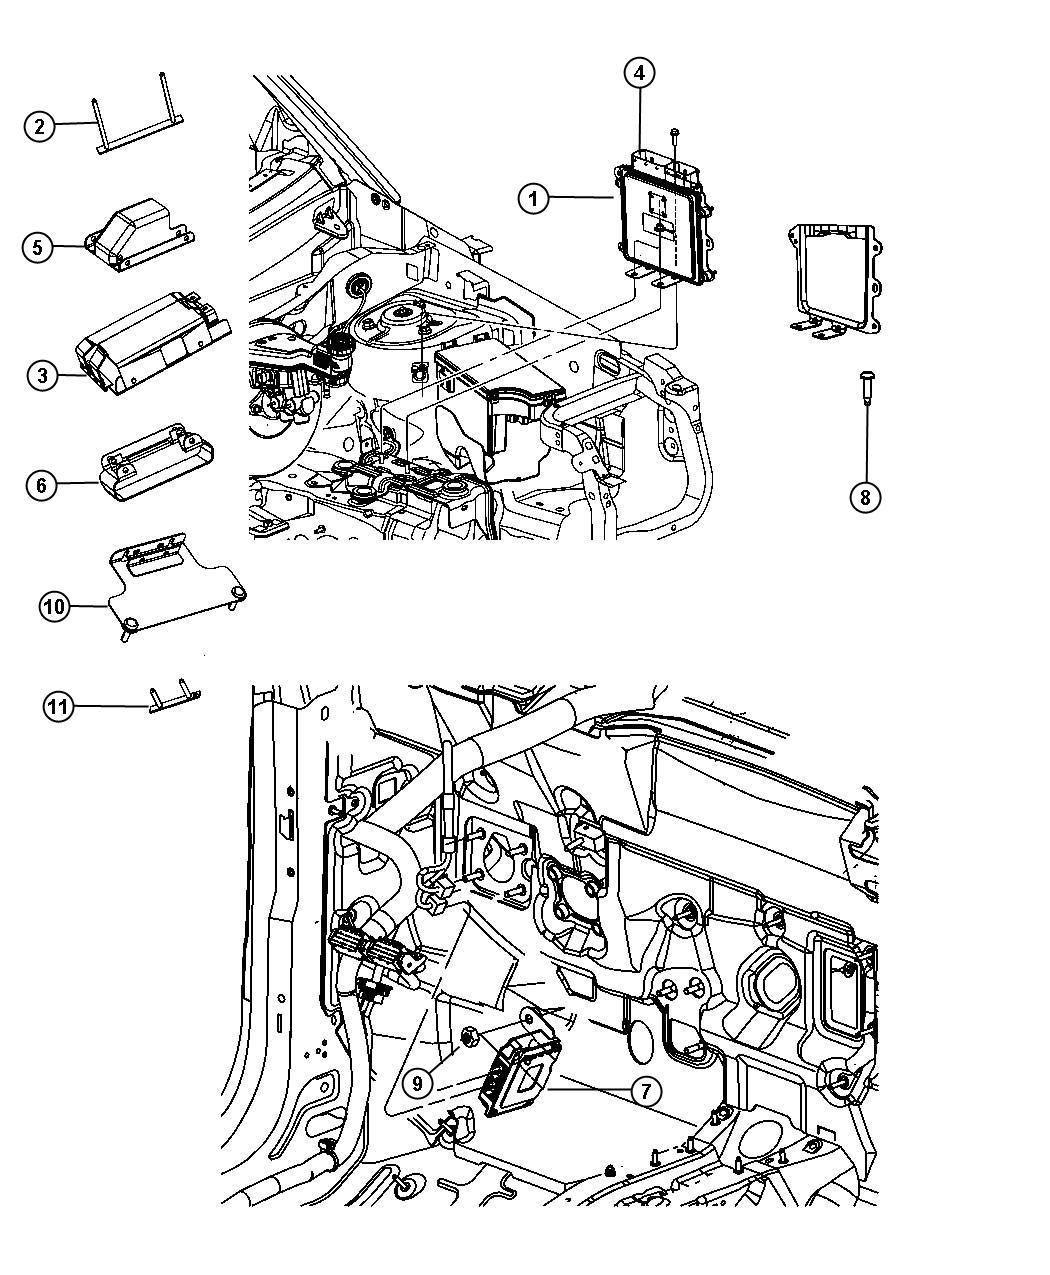 05150542ae jeep module powertrain control engine. Black Bedroom Furniture Sets. Home Design Ideas